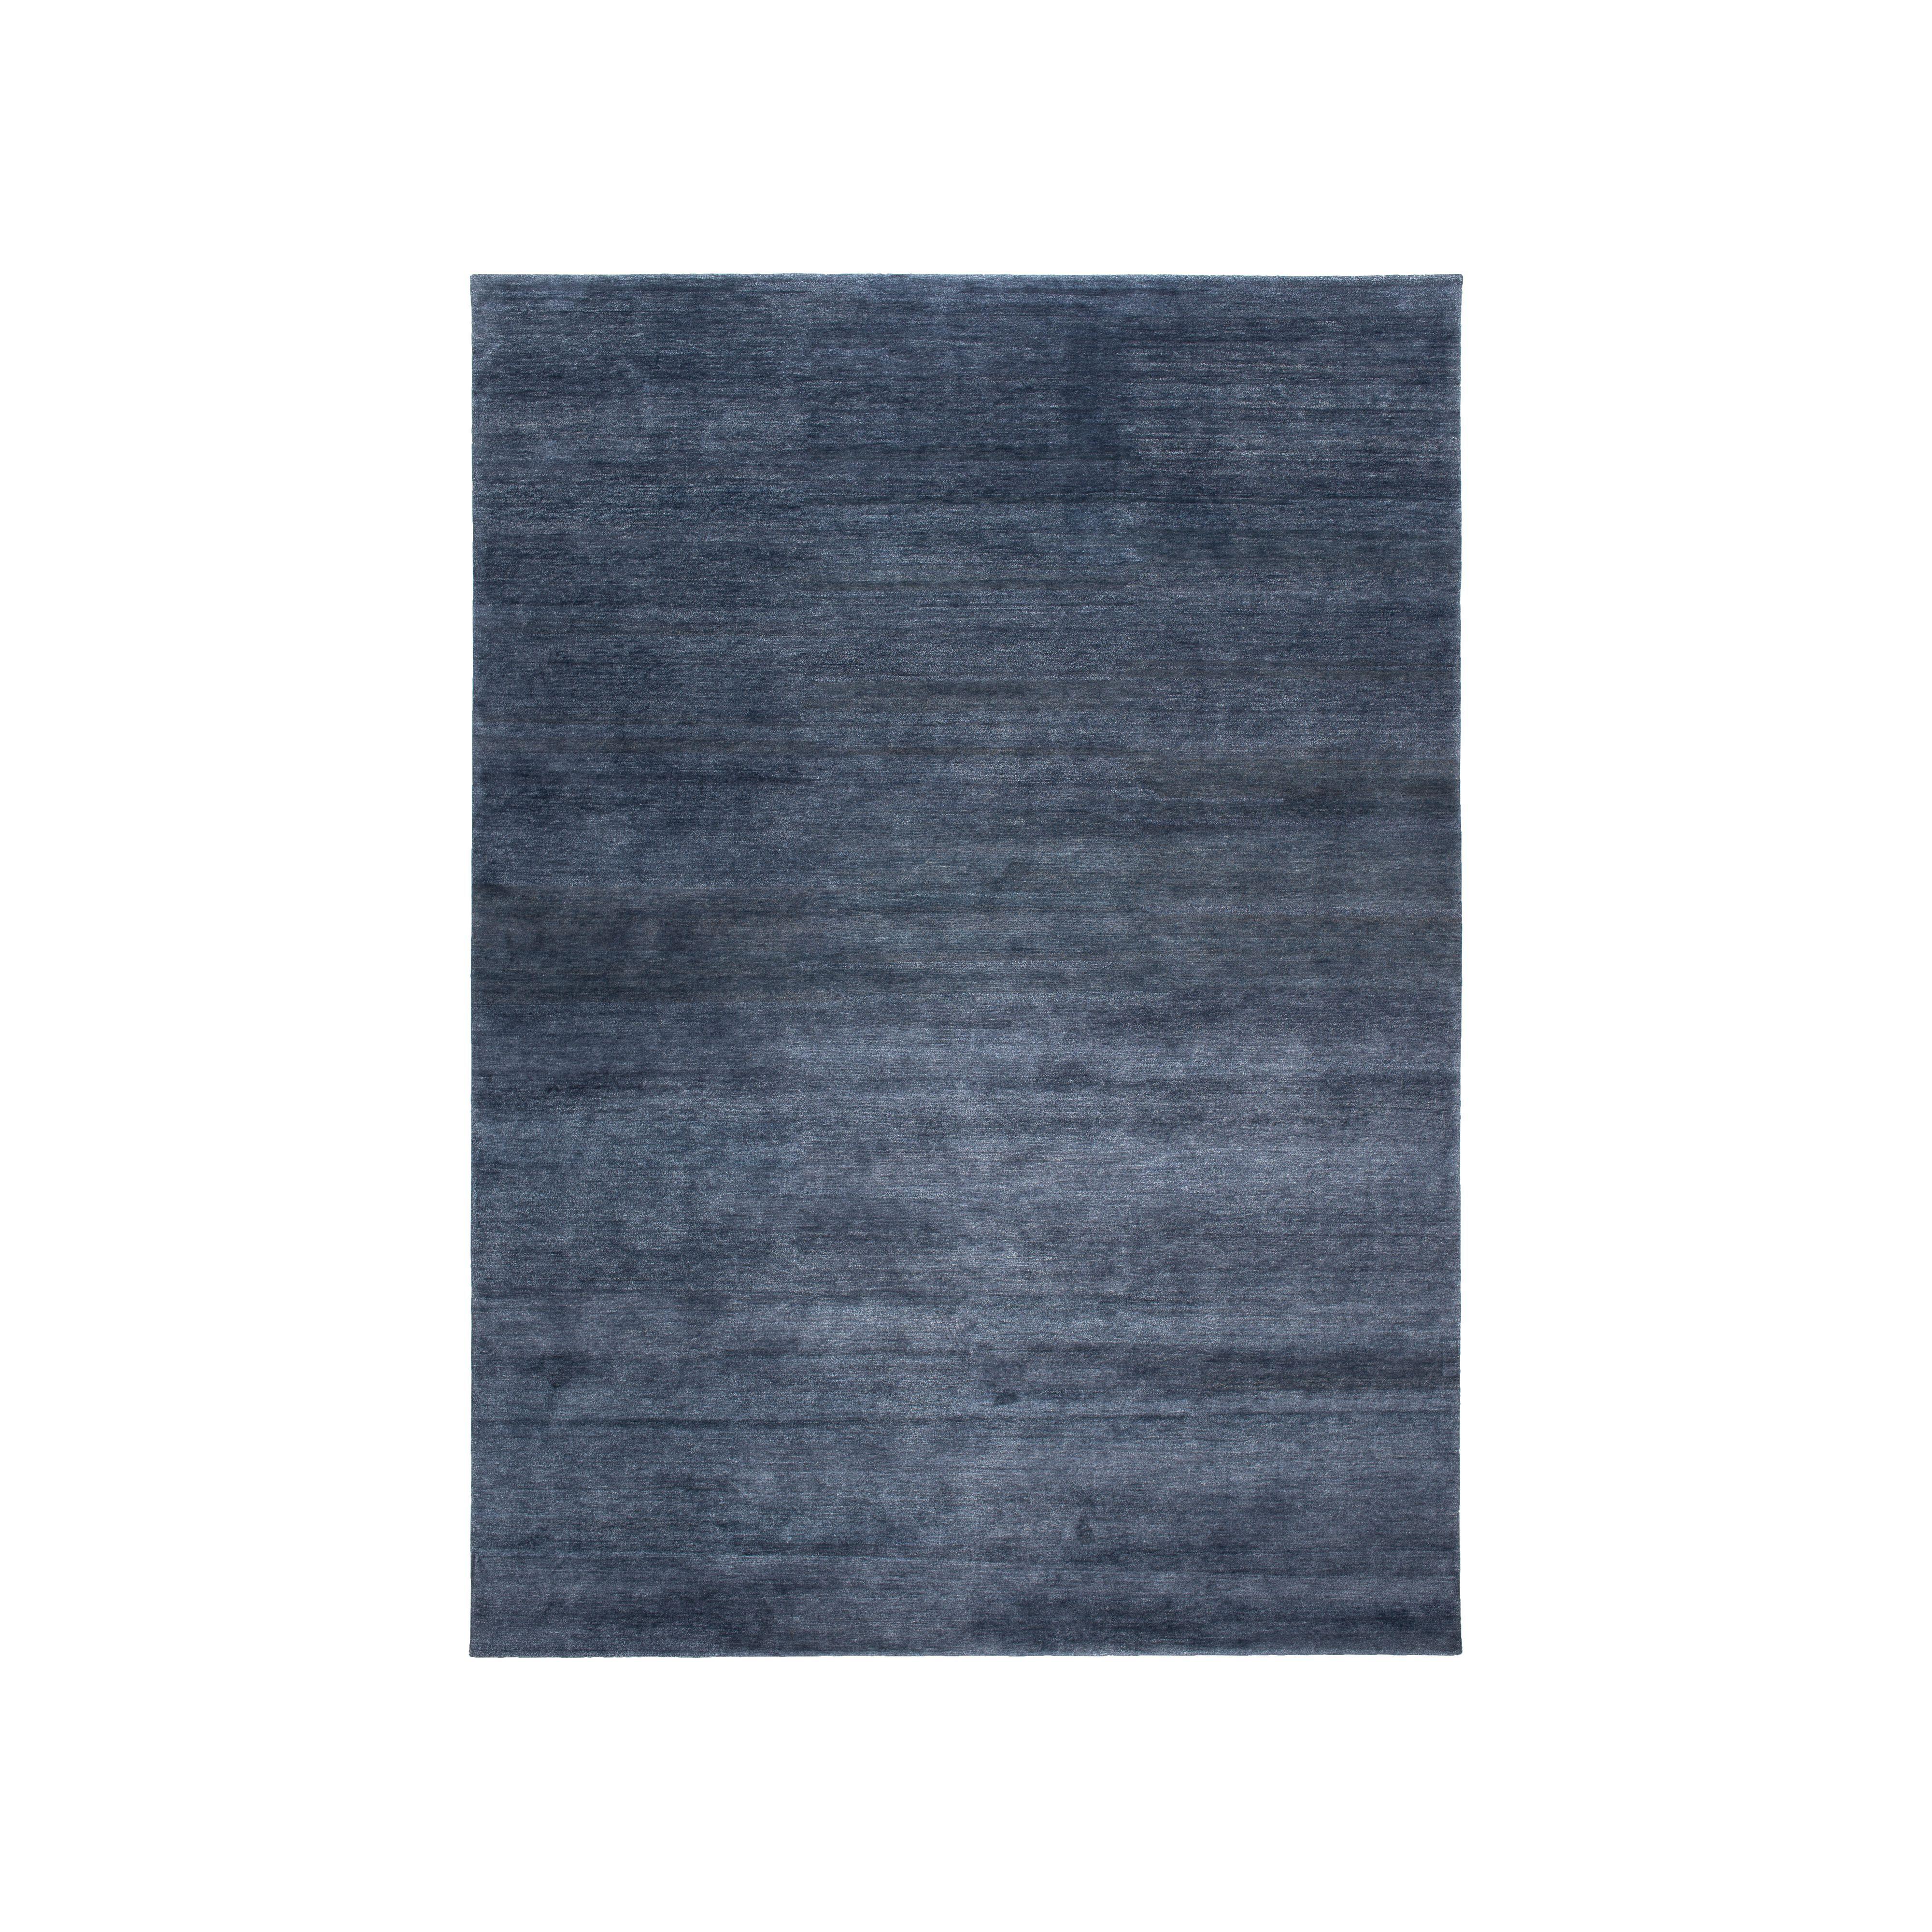 WK-Legends_of_carpets_Kimya-001.tif